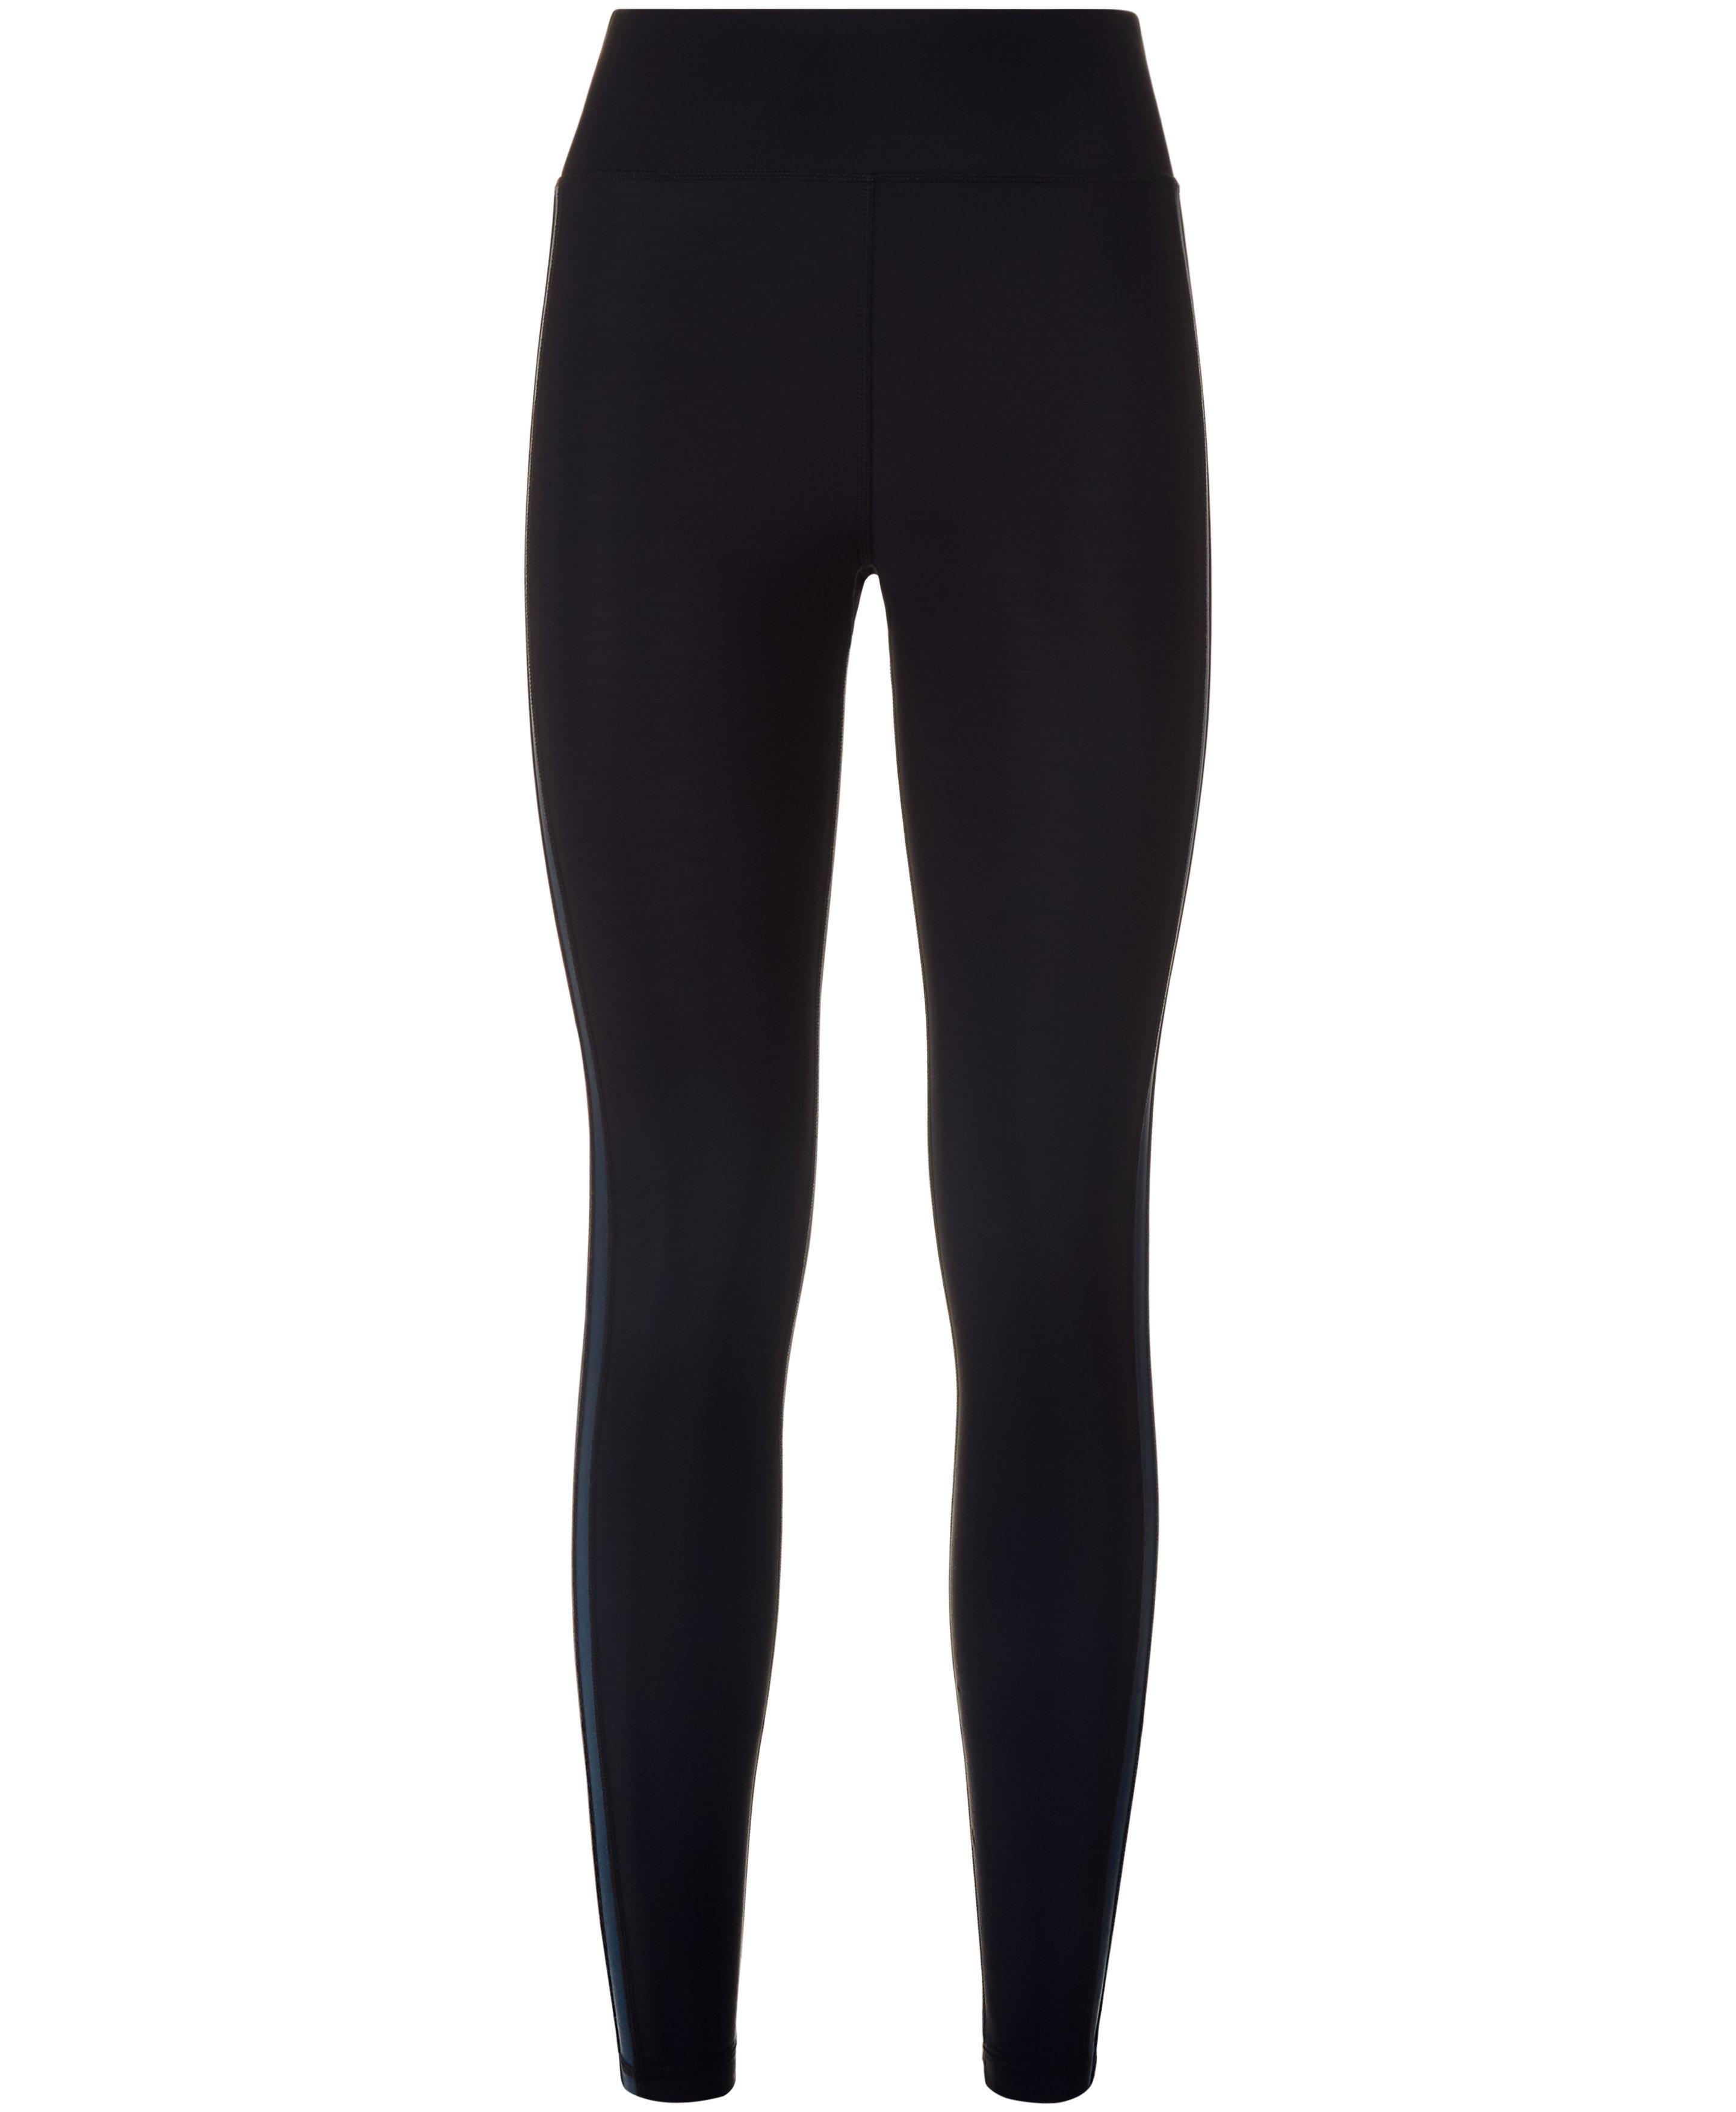 thermodynamic run leggings